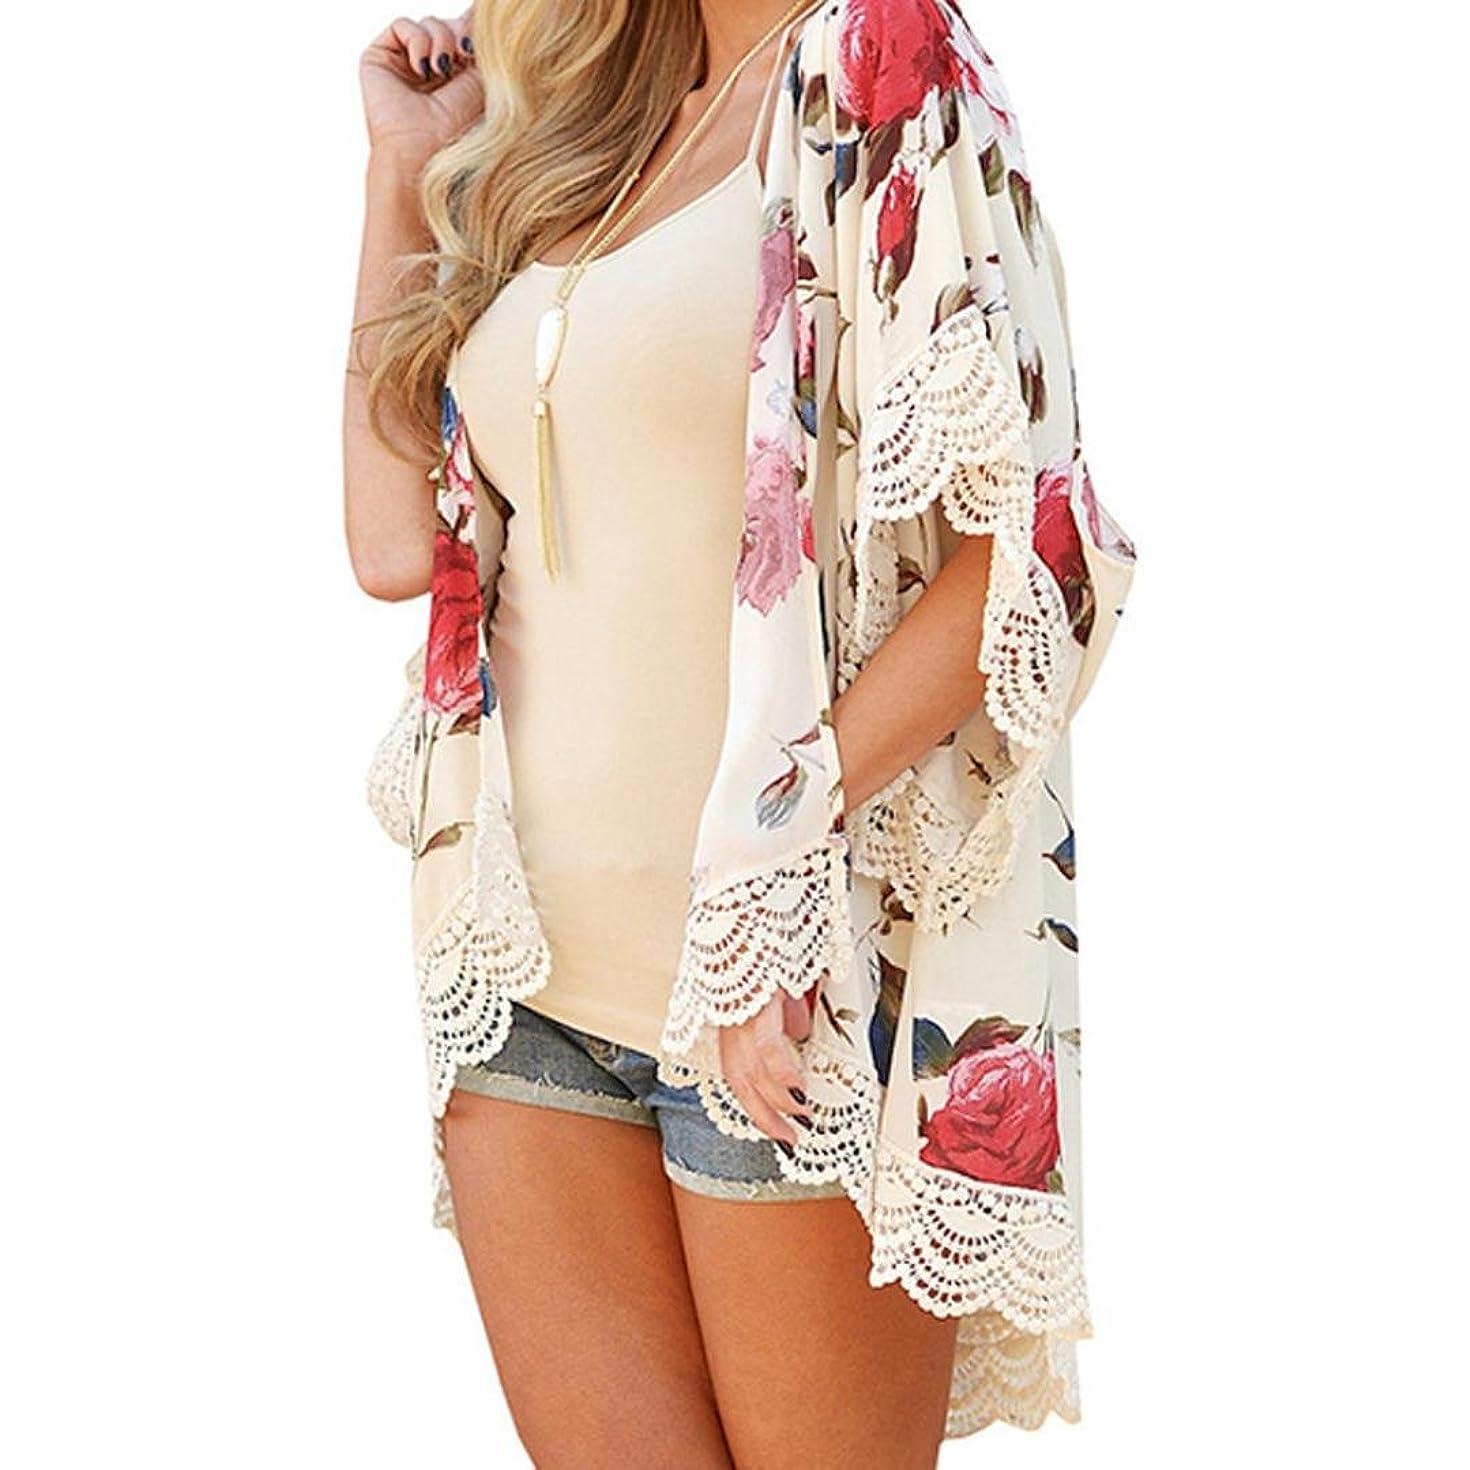 haoricu Women Cardigan, Summer Women's Floral Chiffon Kimono Cardigan Flare Sleeve Loose Blouse Beach Cover up